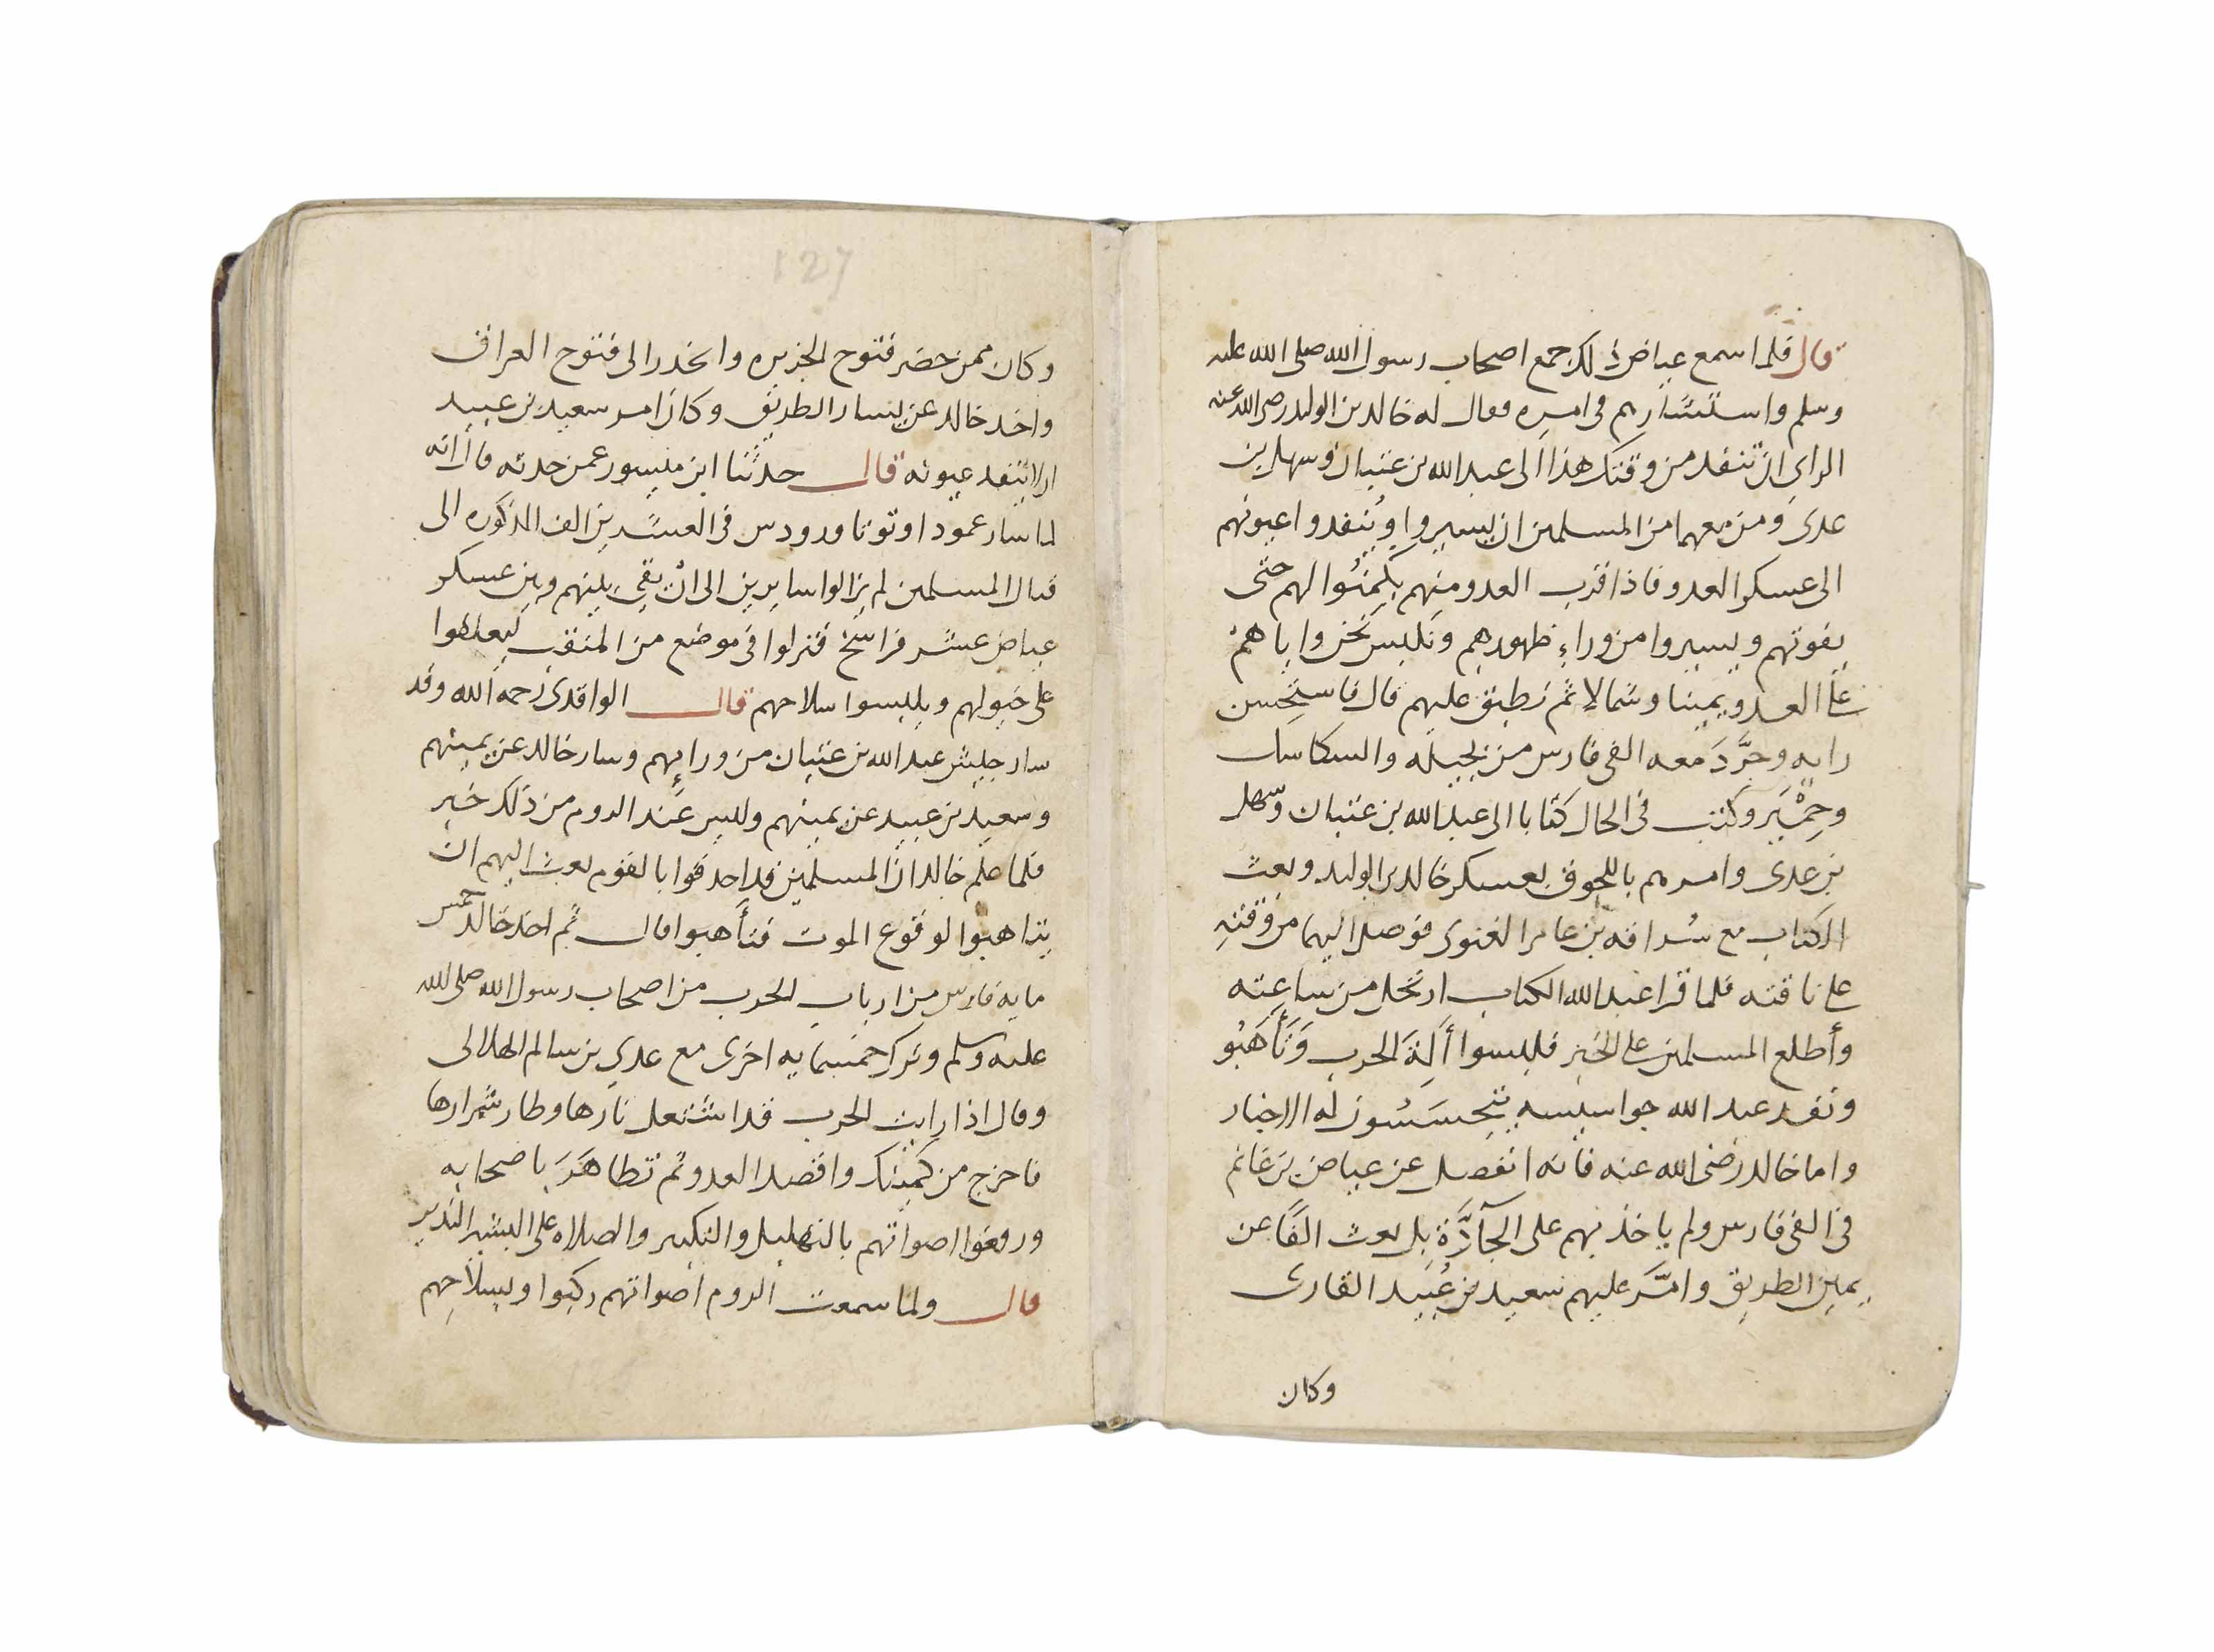 ABU AL-QASIM 'ABD AL-RAHMAN BI